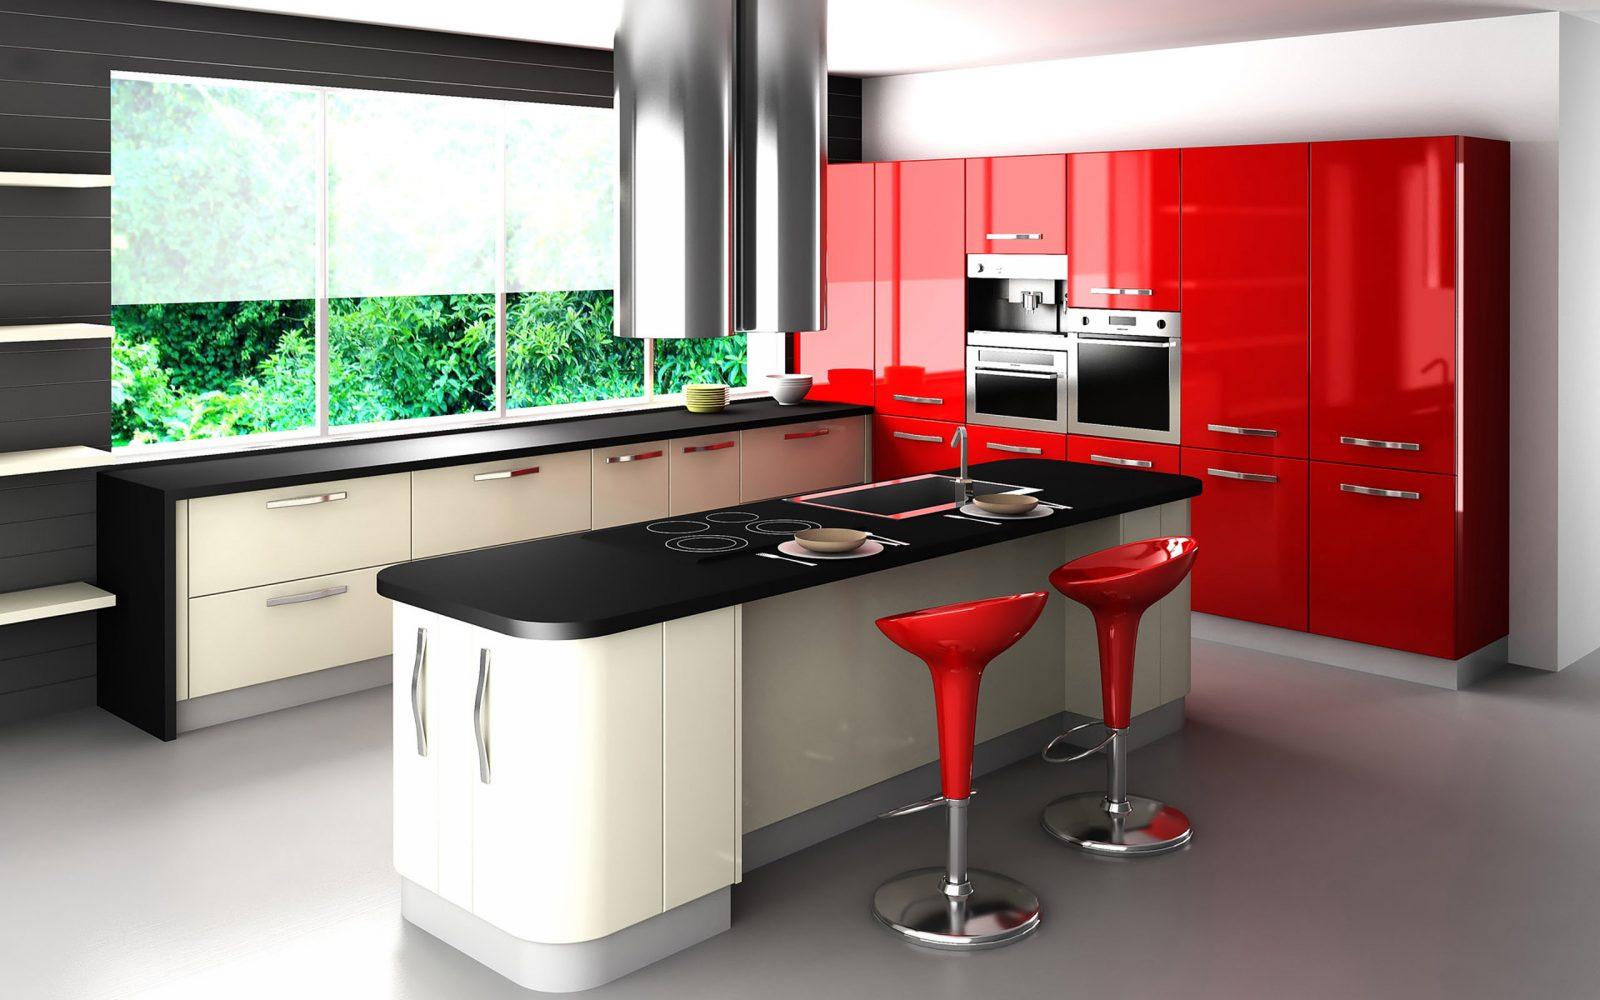 cocina moderna roja